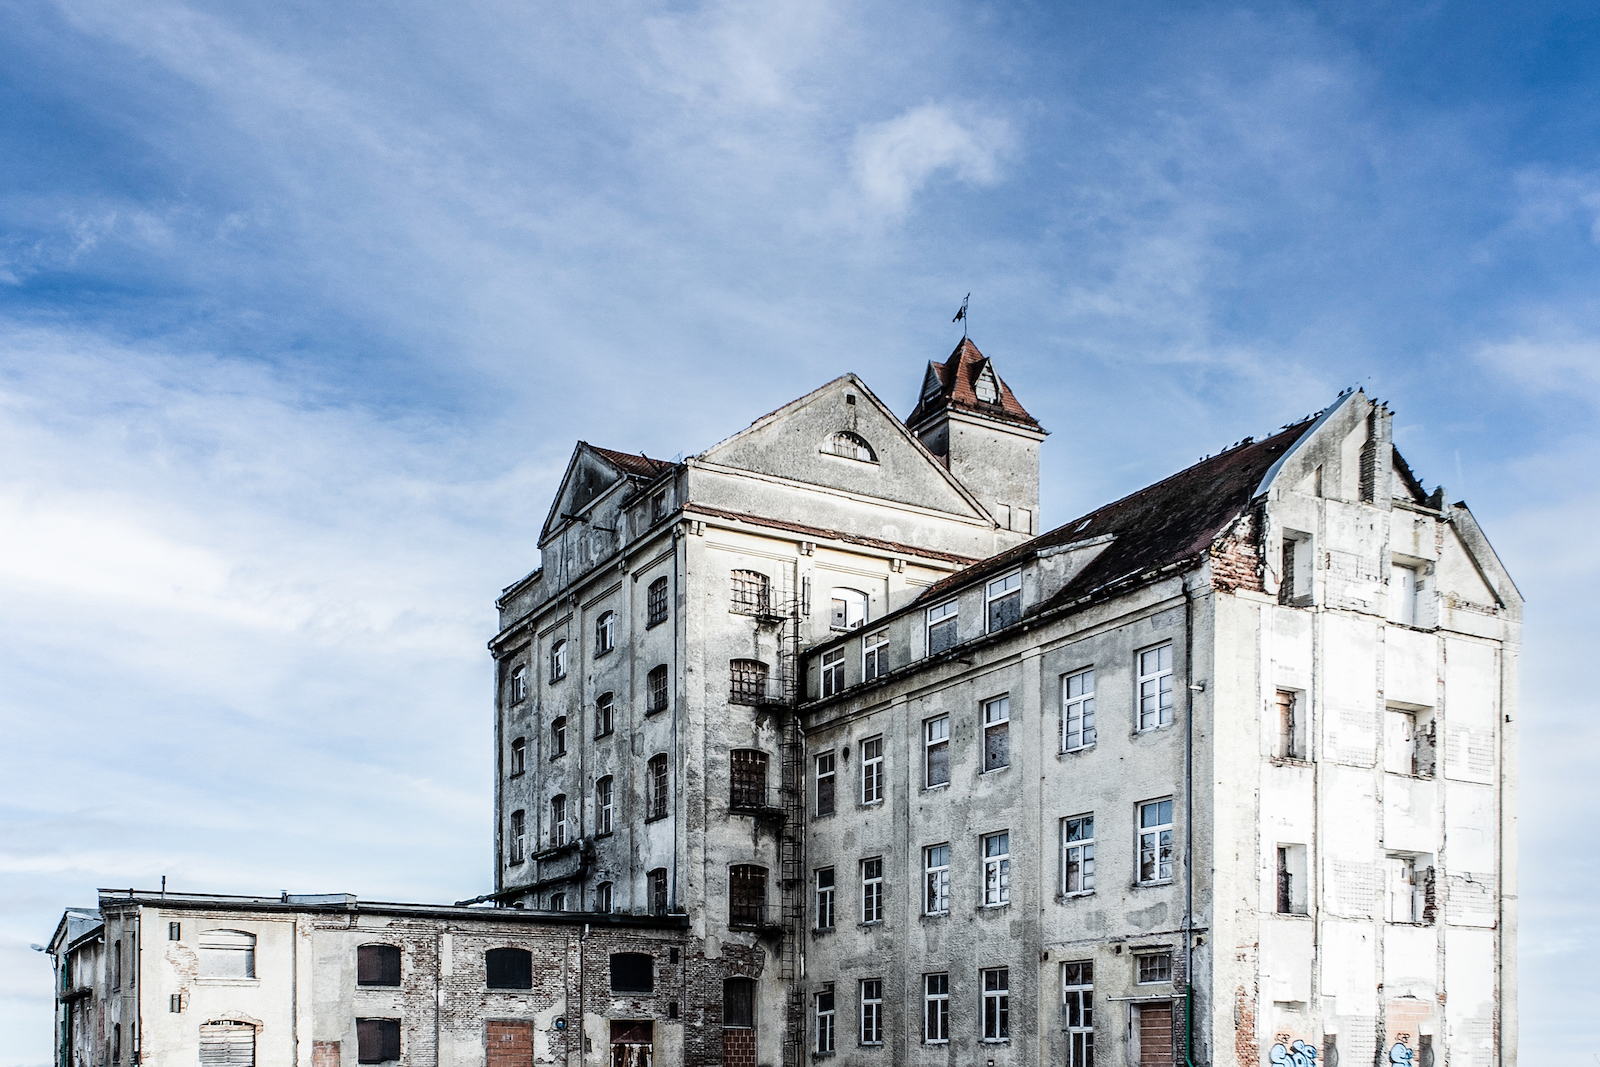 Lost Place Munich